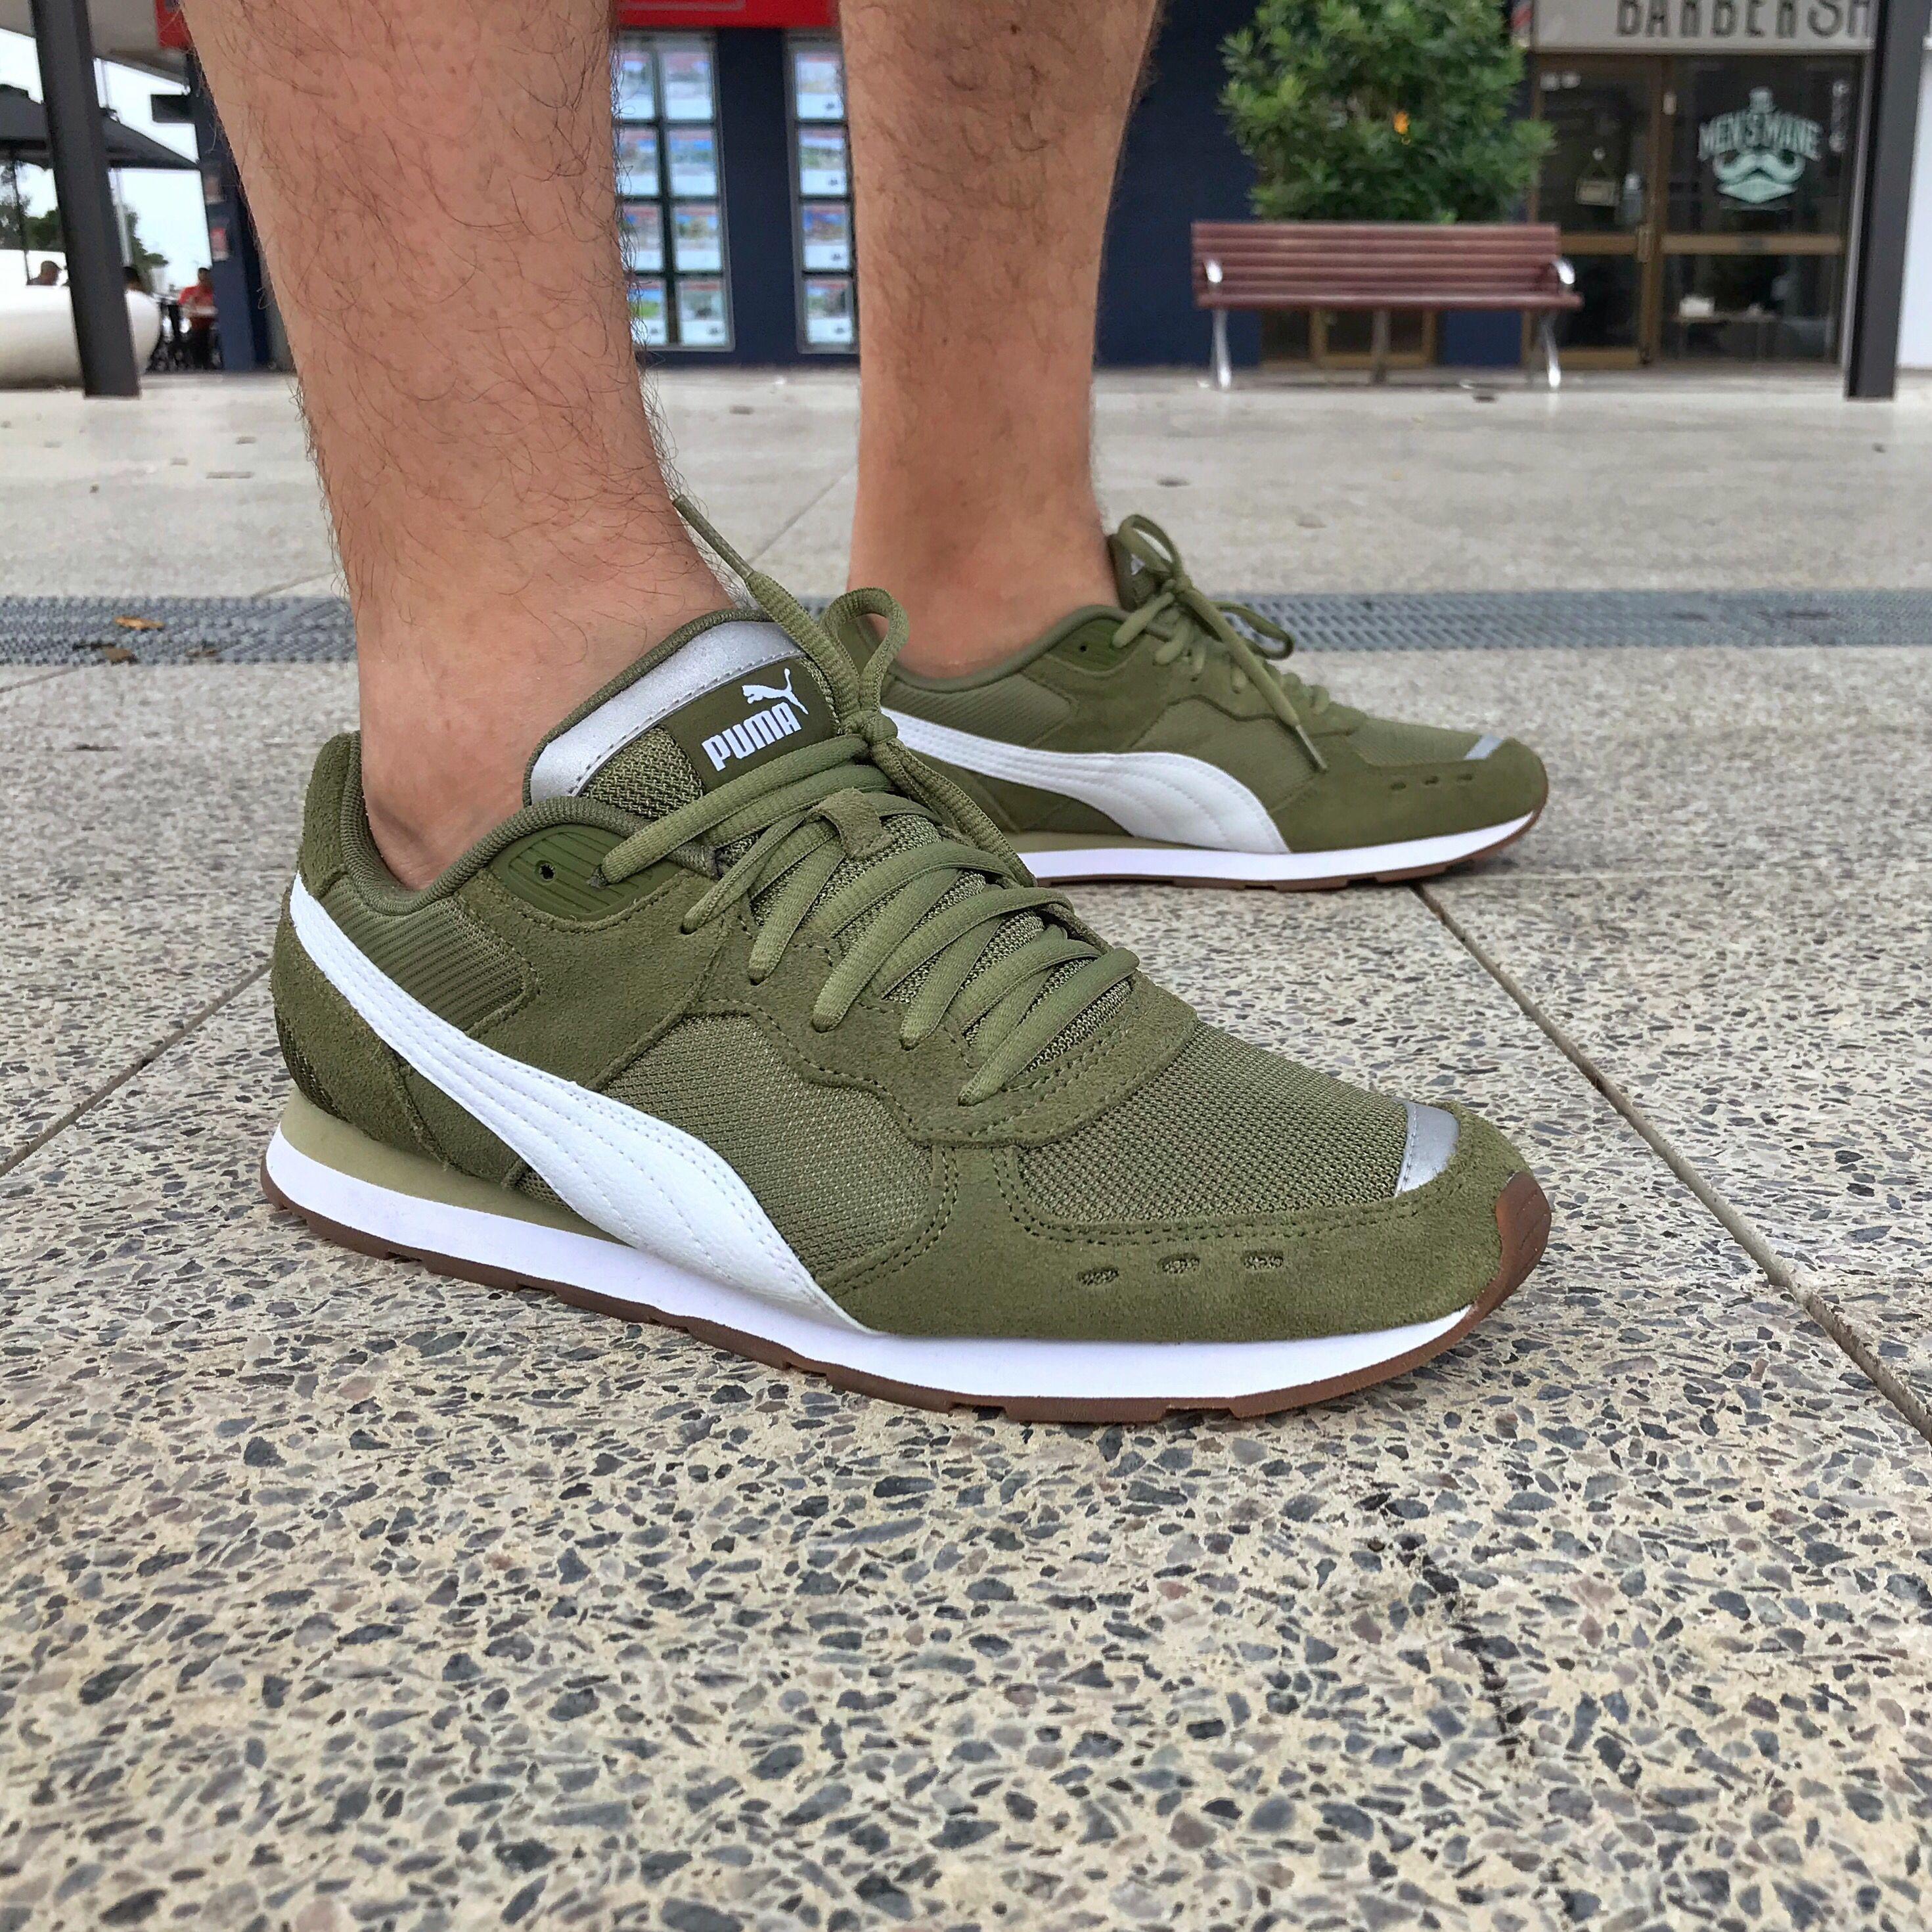 Pin by Petr on Boty | Sneakers, Shoes, Sportswear brand